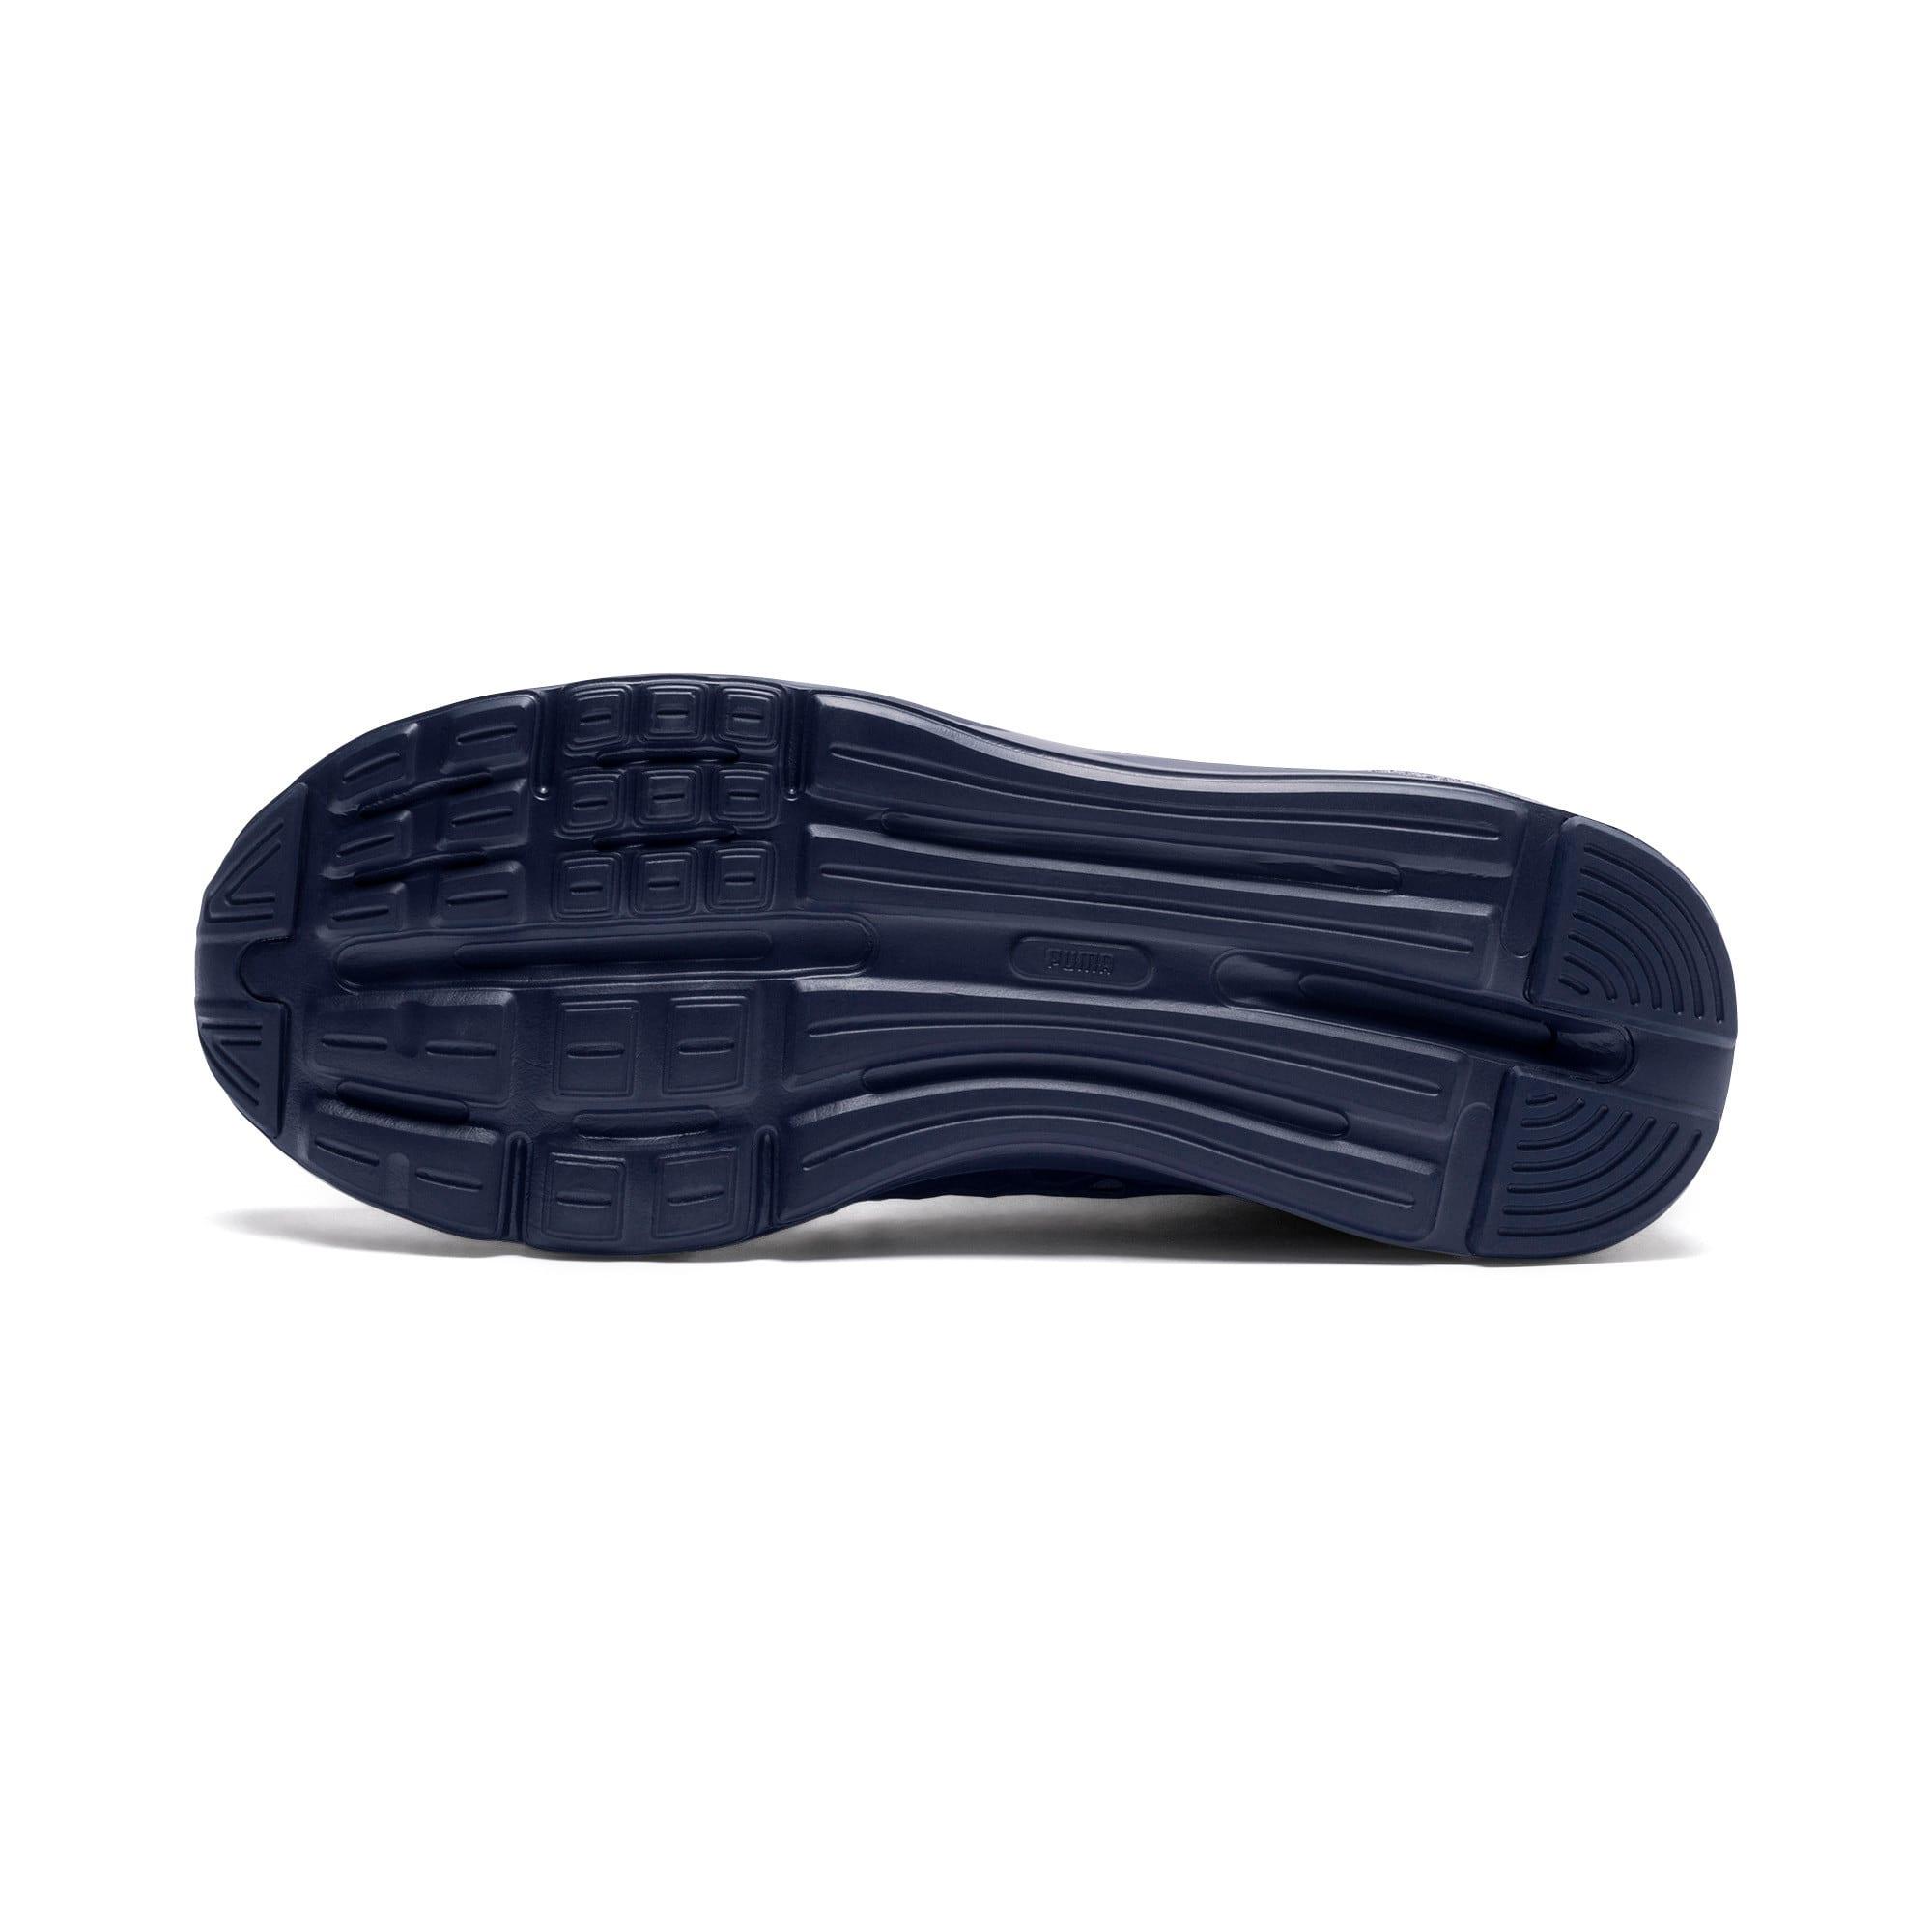 Thumbnail 3 of Enzo NF Mid Men's Training Shoes, Peacoat-Quarry, medium